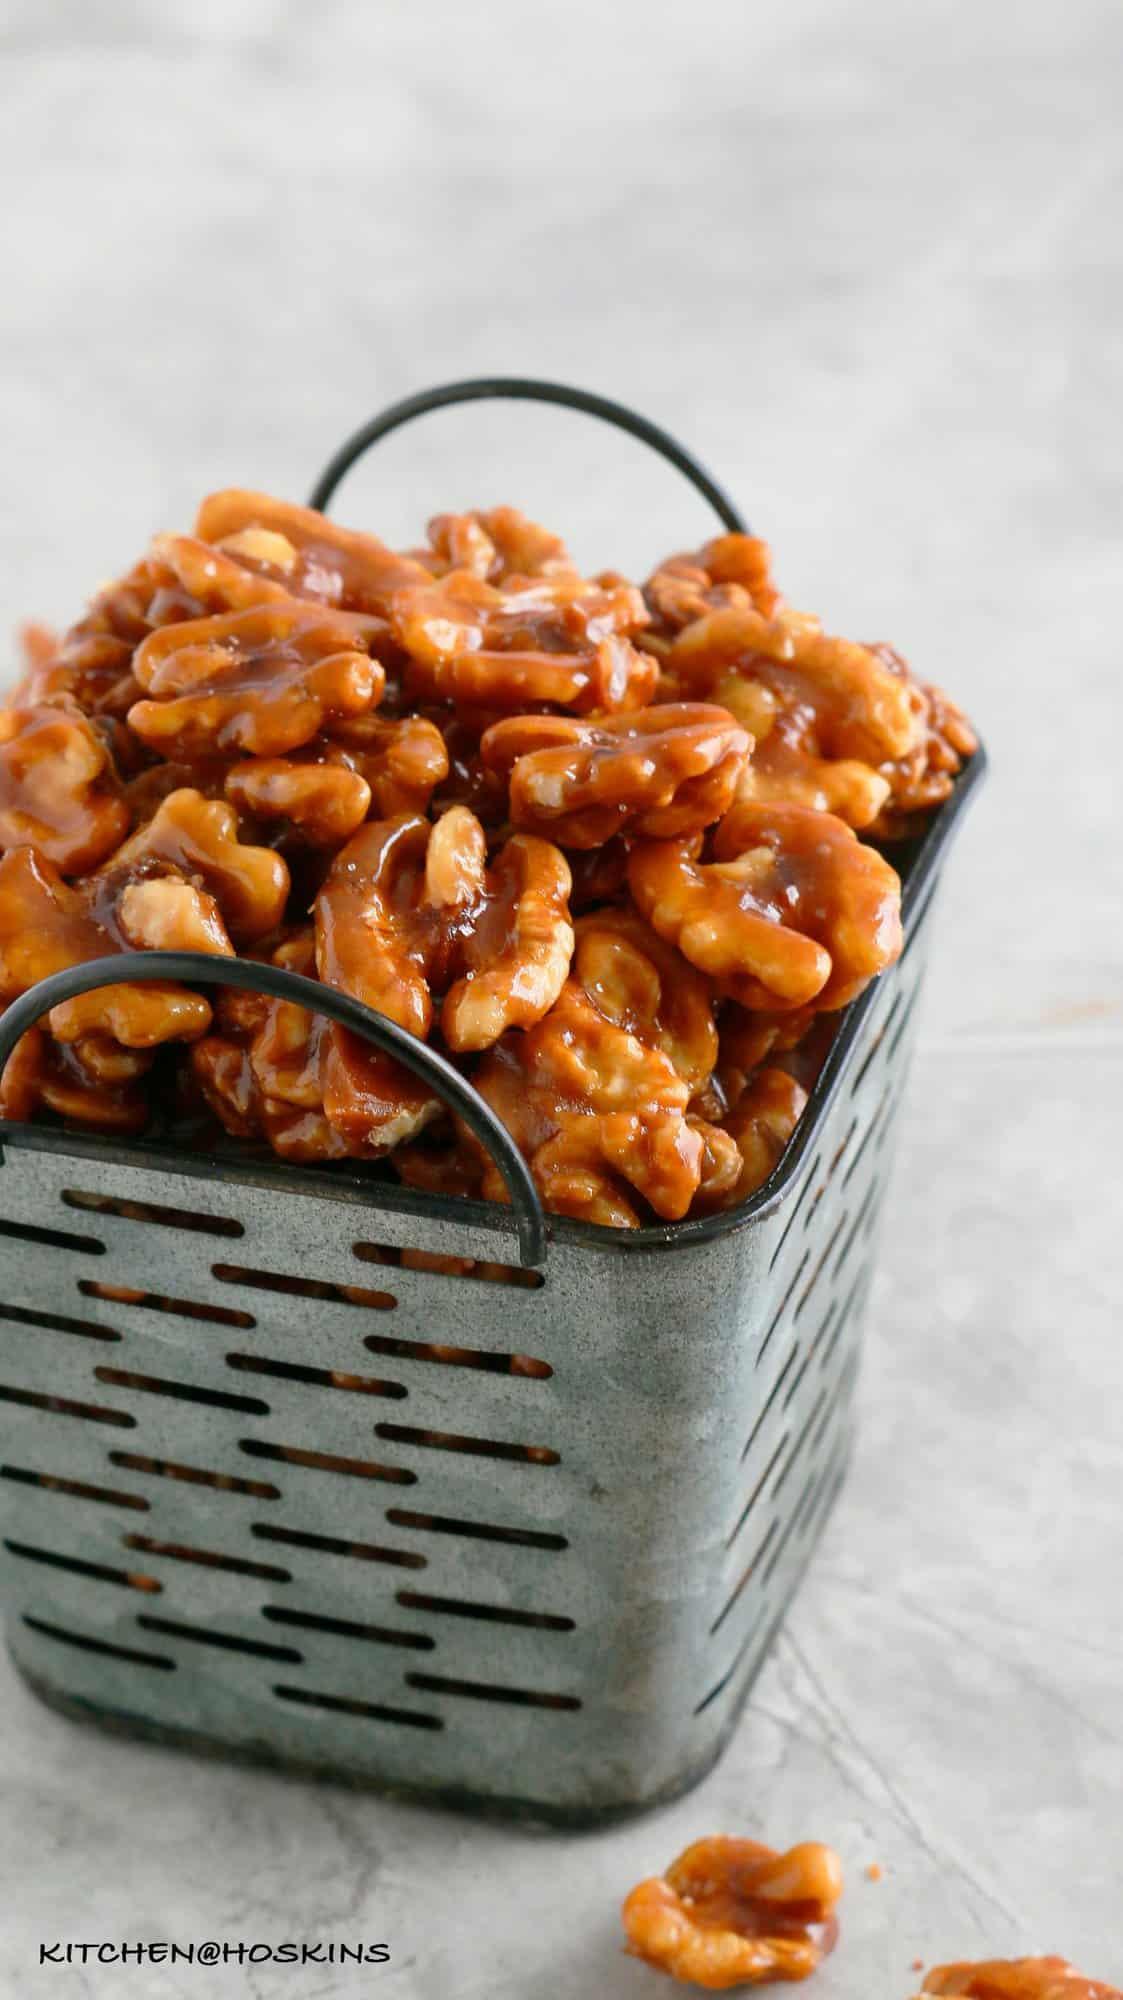 square enamel basket filled with CARAMEL WALNUTS